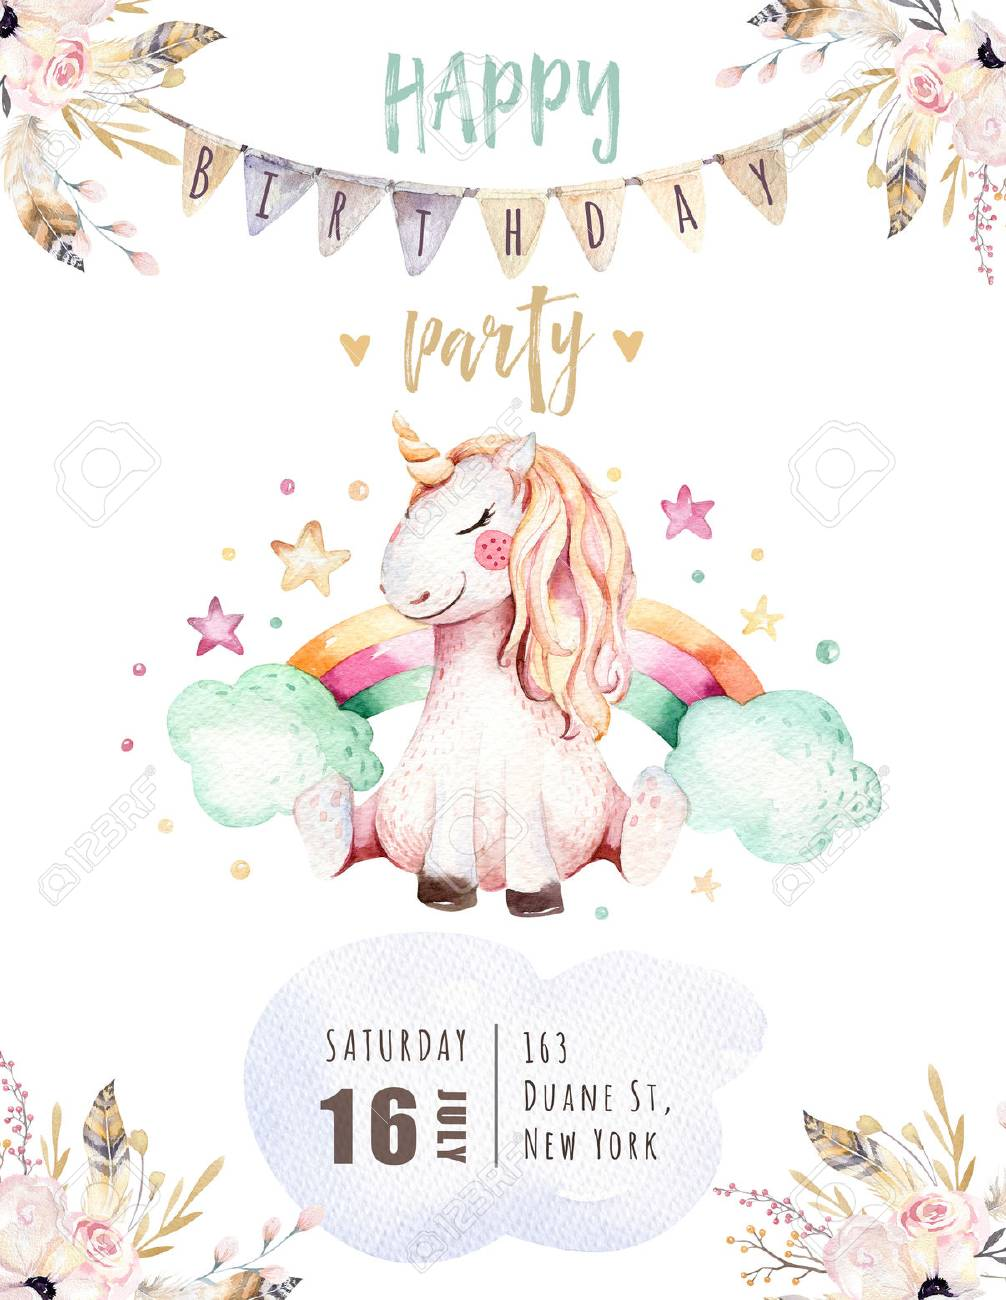 isole mignon aquarelle licorne carte de l 39 invitation licornes de princesse illustration licornes arc de main hippie rose signe de fauteuil